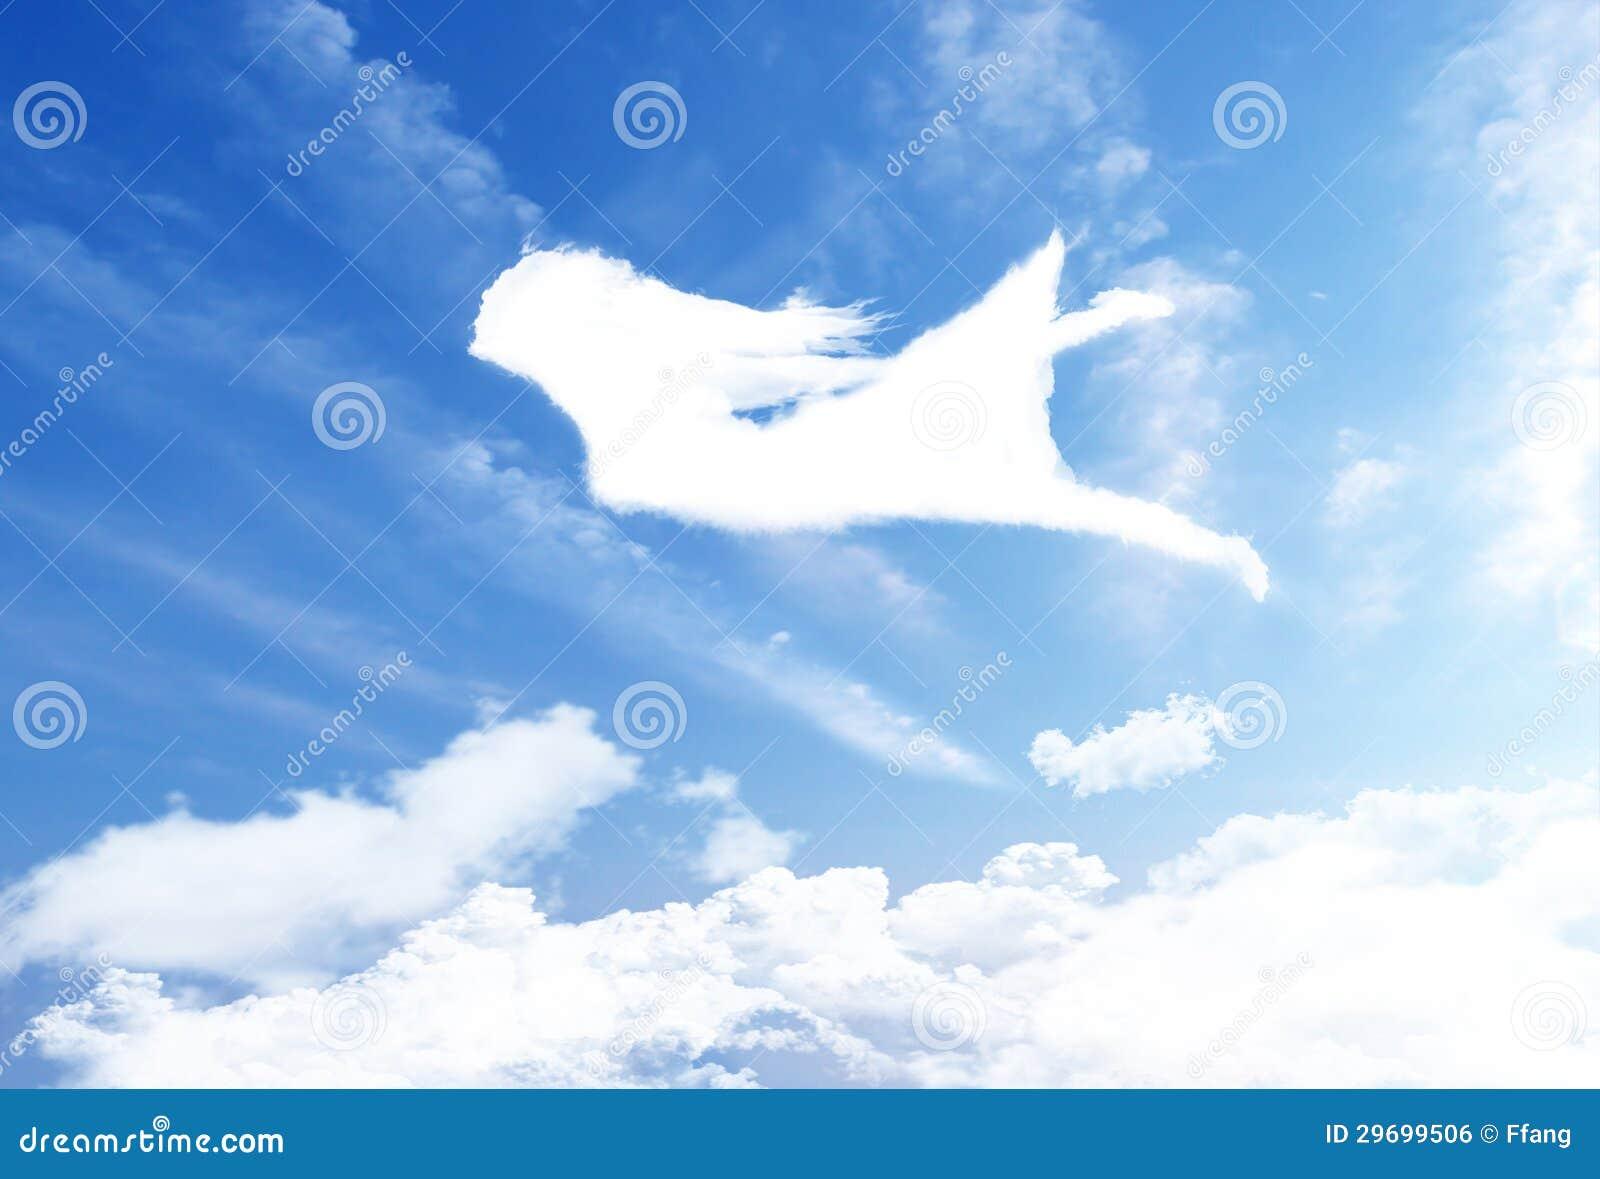 Flying over clouds sky 29699506 jpg